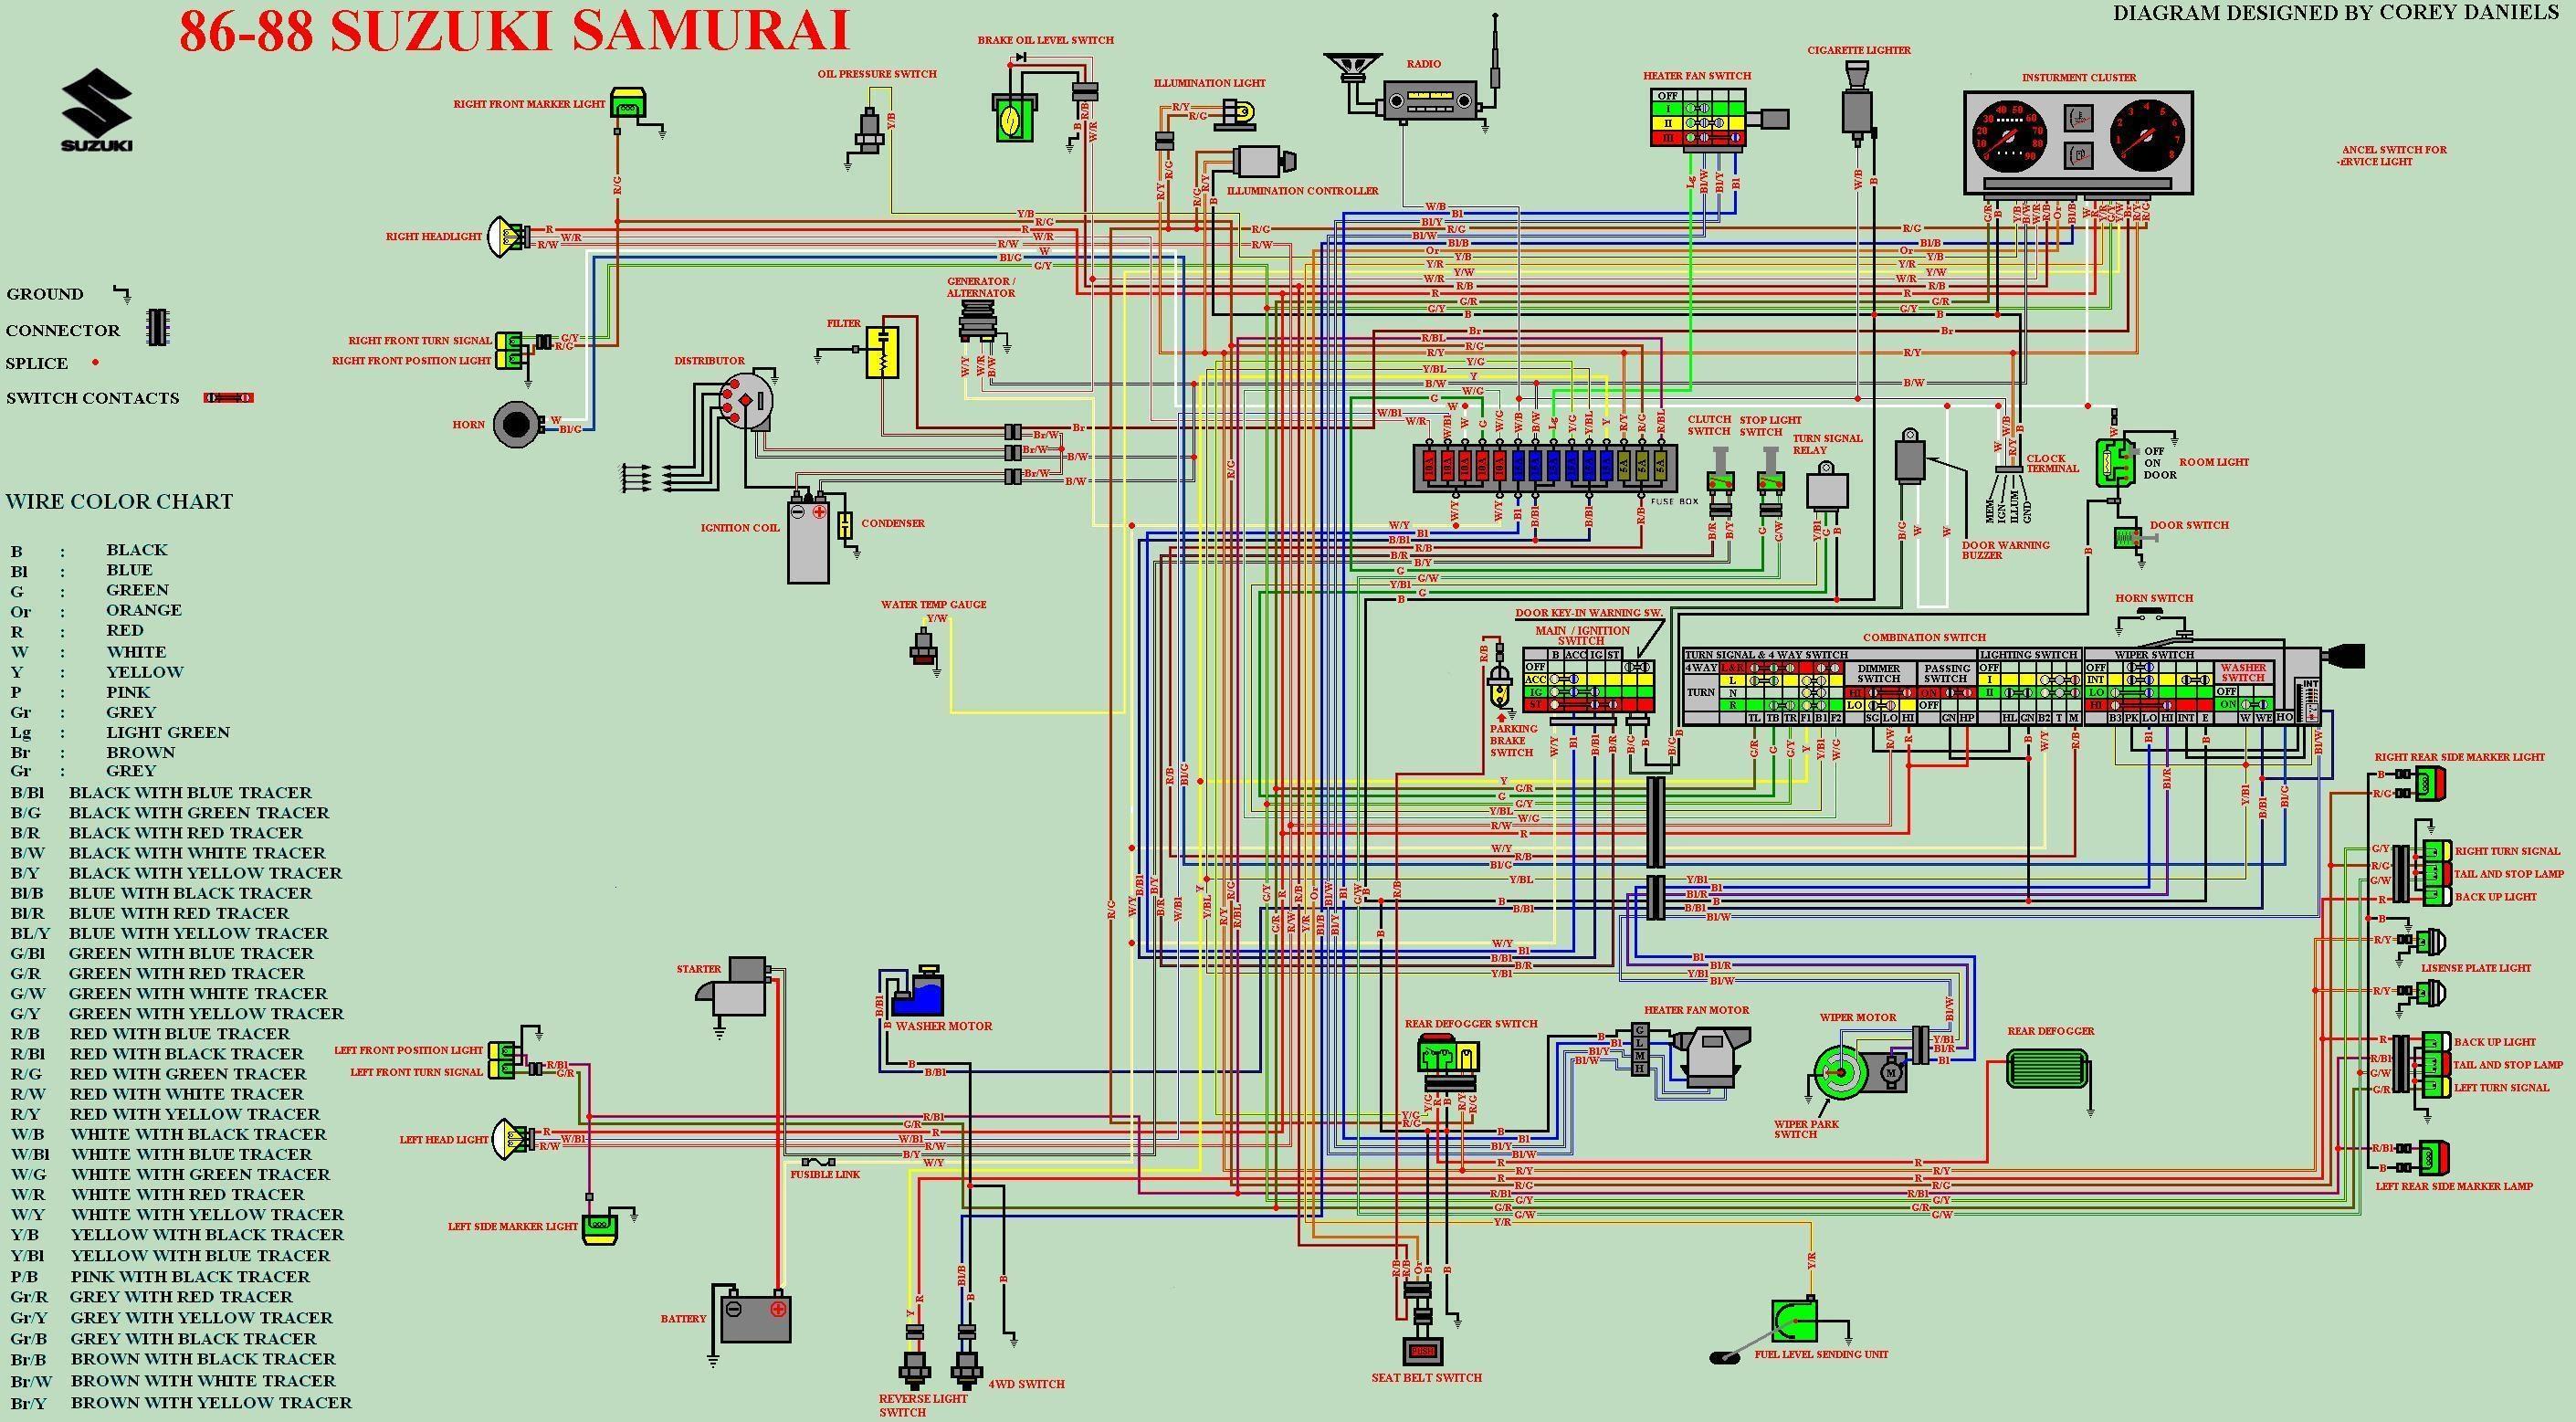 wiring diagram for suzuki samurai - wiring diagrams work-site -  work-site.alcuoredeldiabete.it  al cuore del diabete